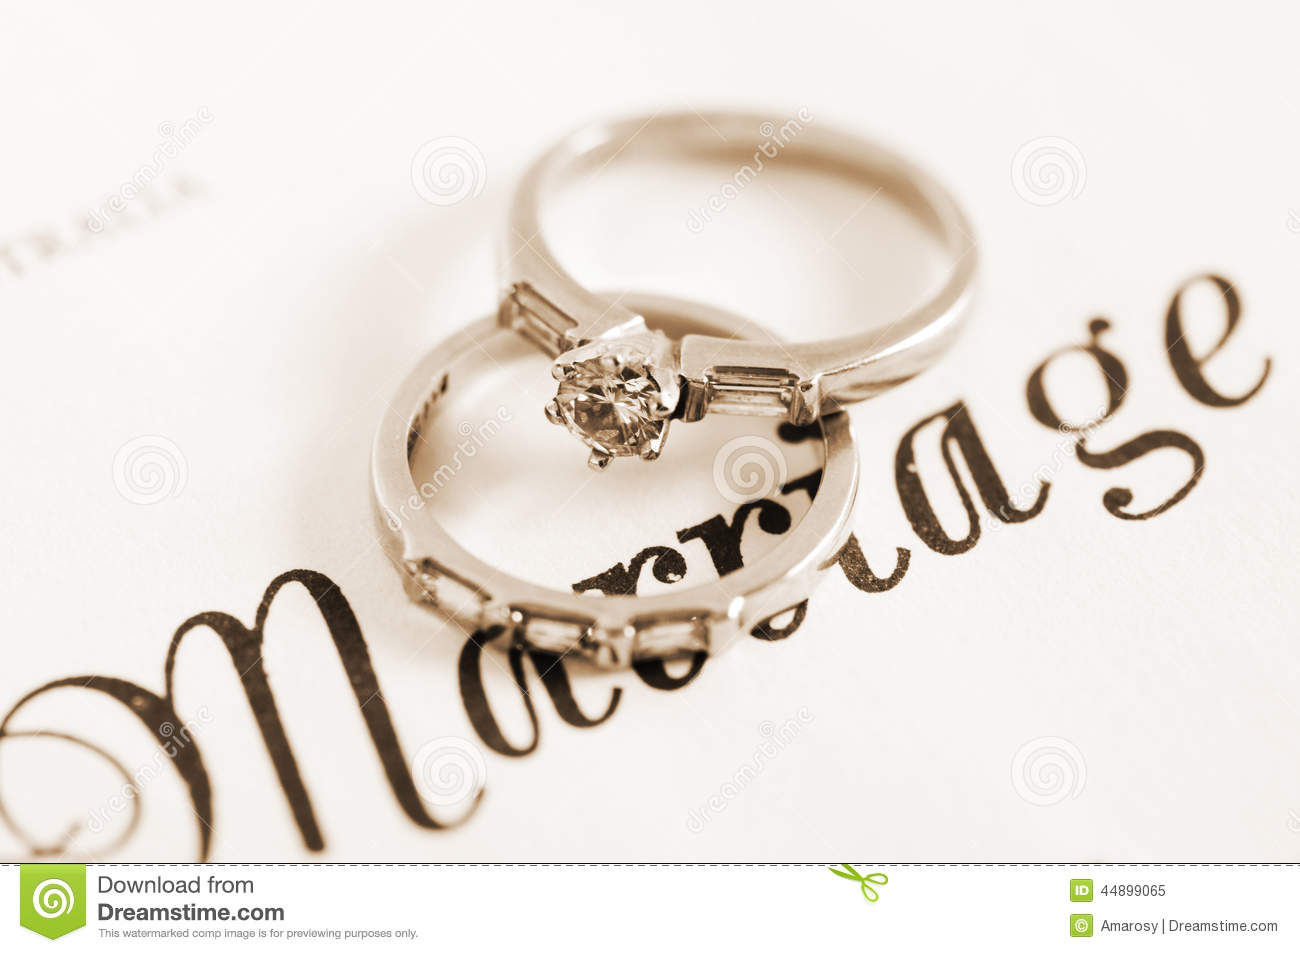 sepia-vintage-retro-style-wedding-diamond-engagement-rings-marriage-certificate-closeup-macro-44899065